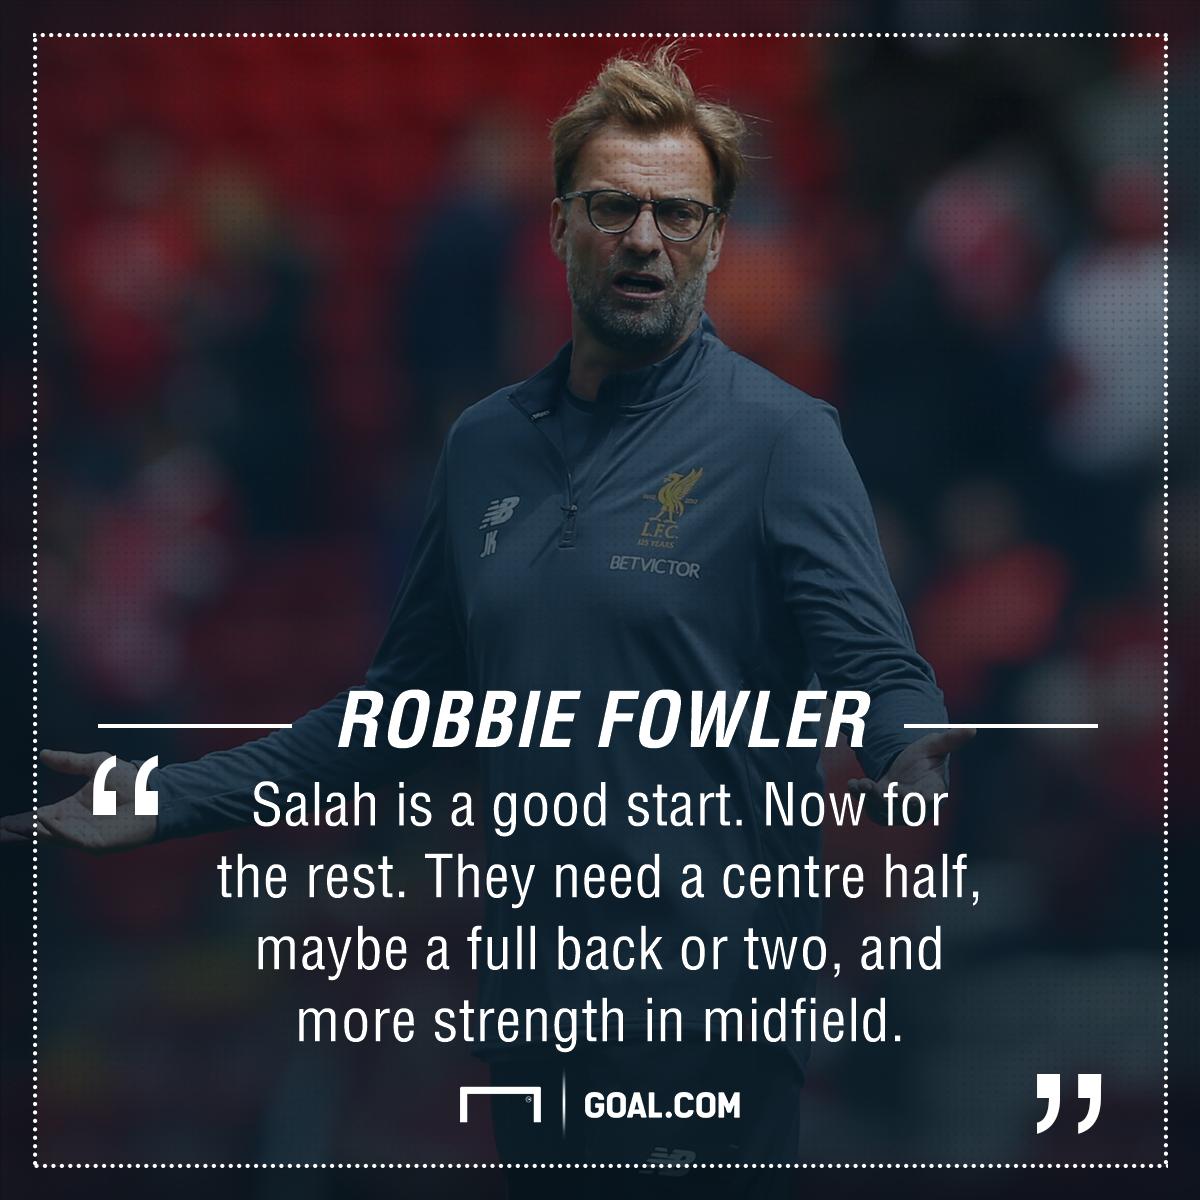 Robbie Fowler Liverpool signings